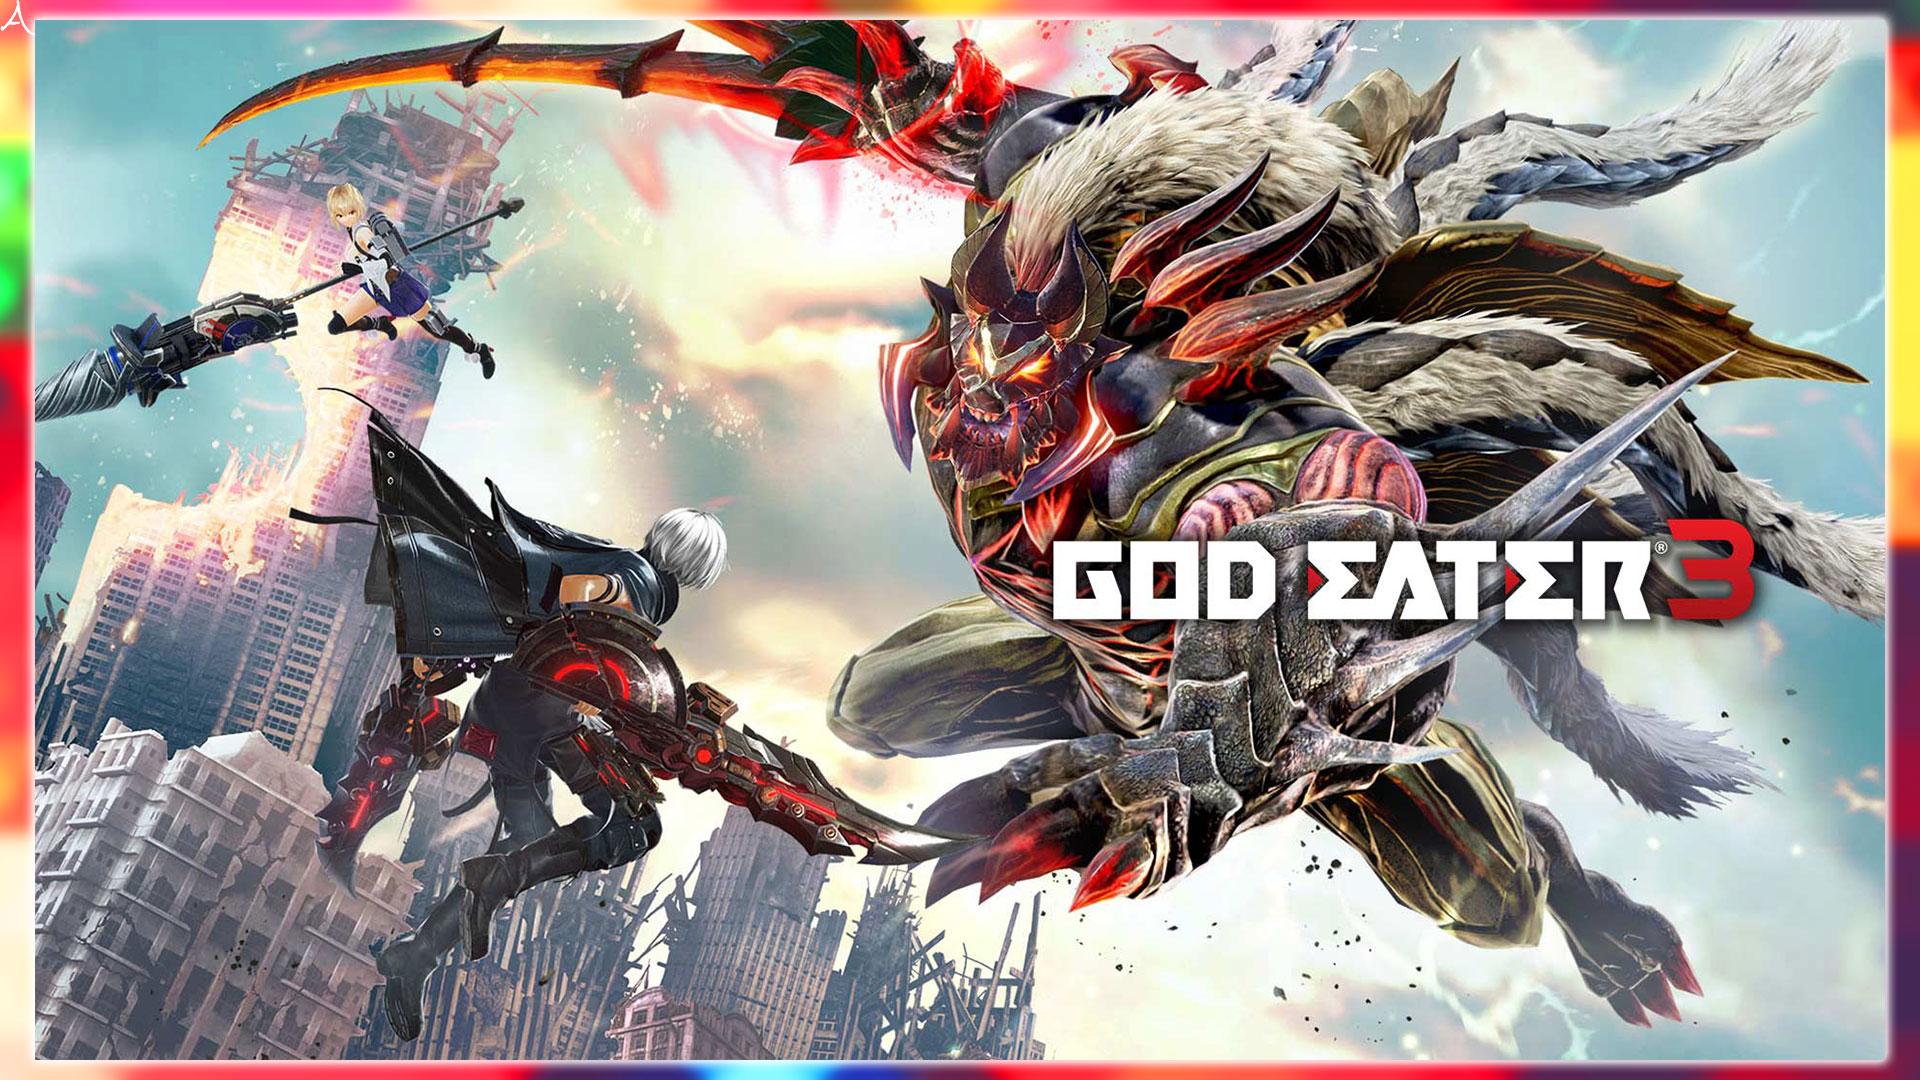 PC版「GOD EATER 3」に必要な最低/推奨スペックを確認:快適プレイに必要な値段はどれくらい?